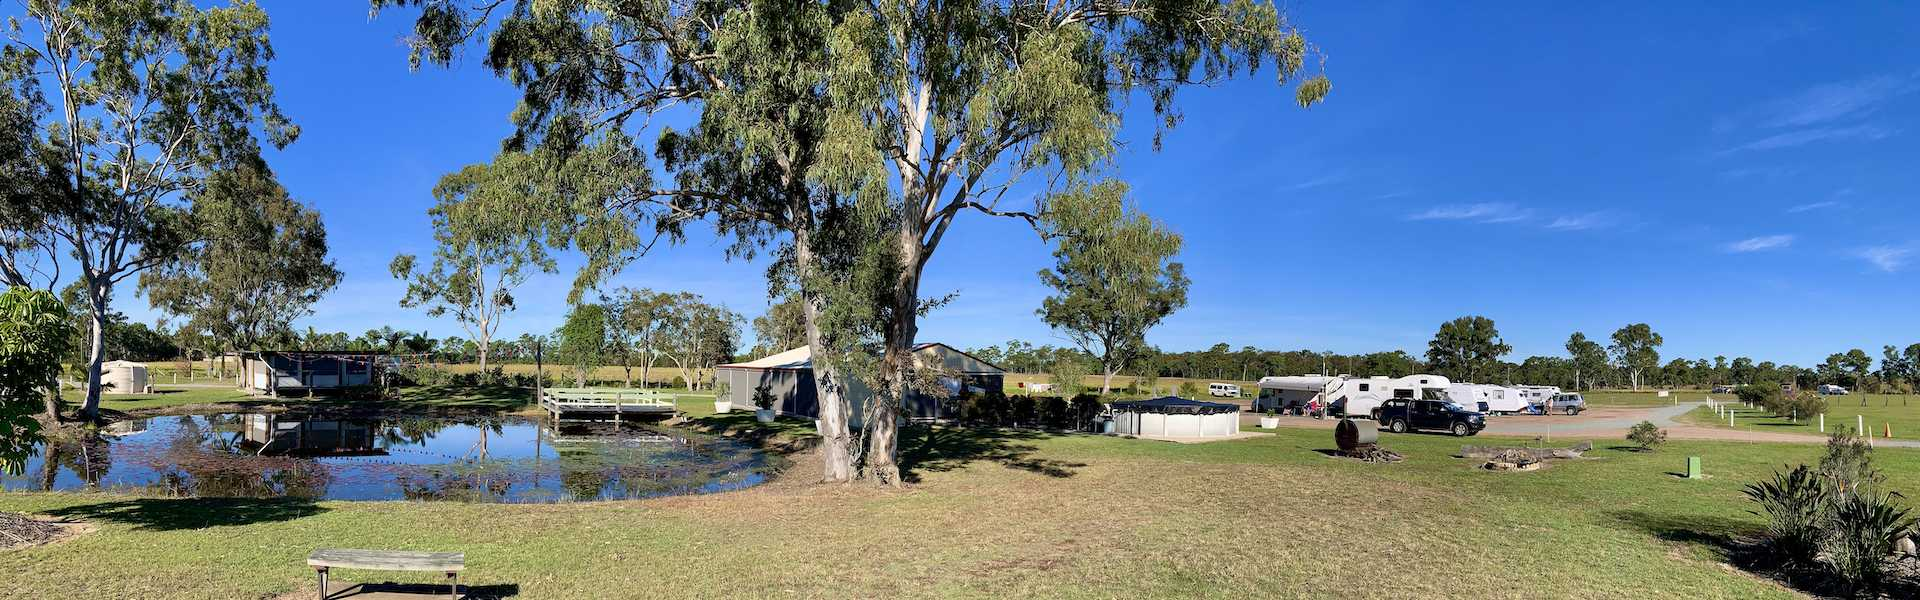 Kui Parks, Cheery Nomad RV Park & Farmstay, Maryborough QLD